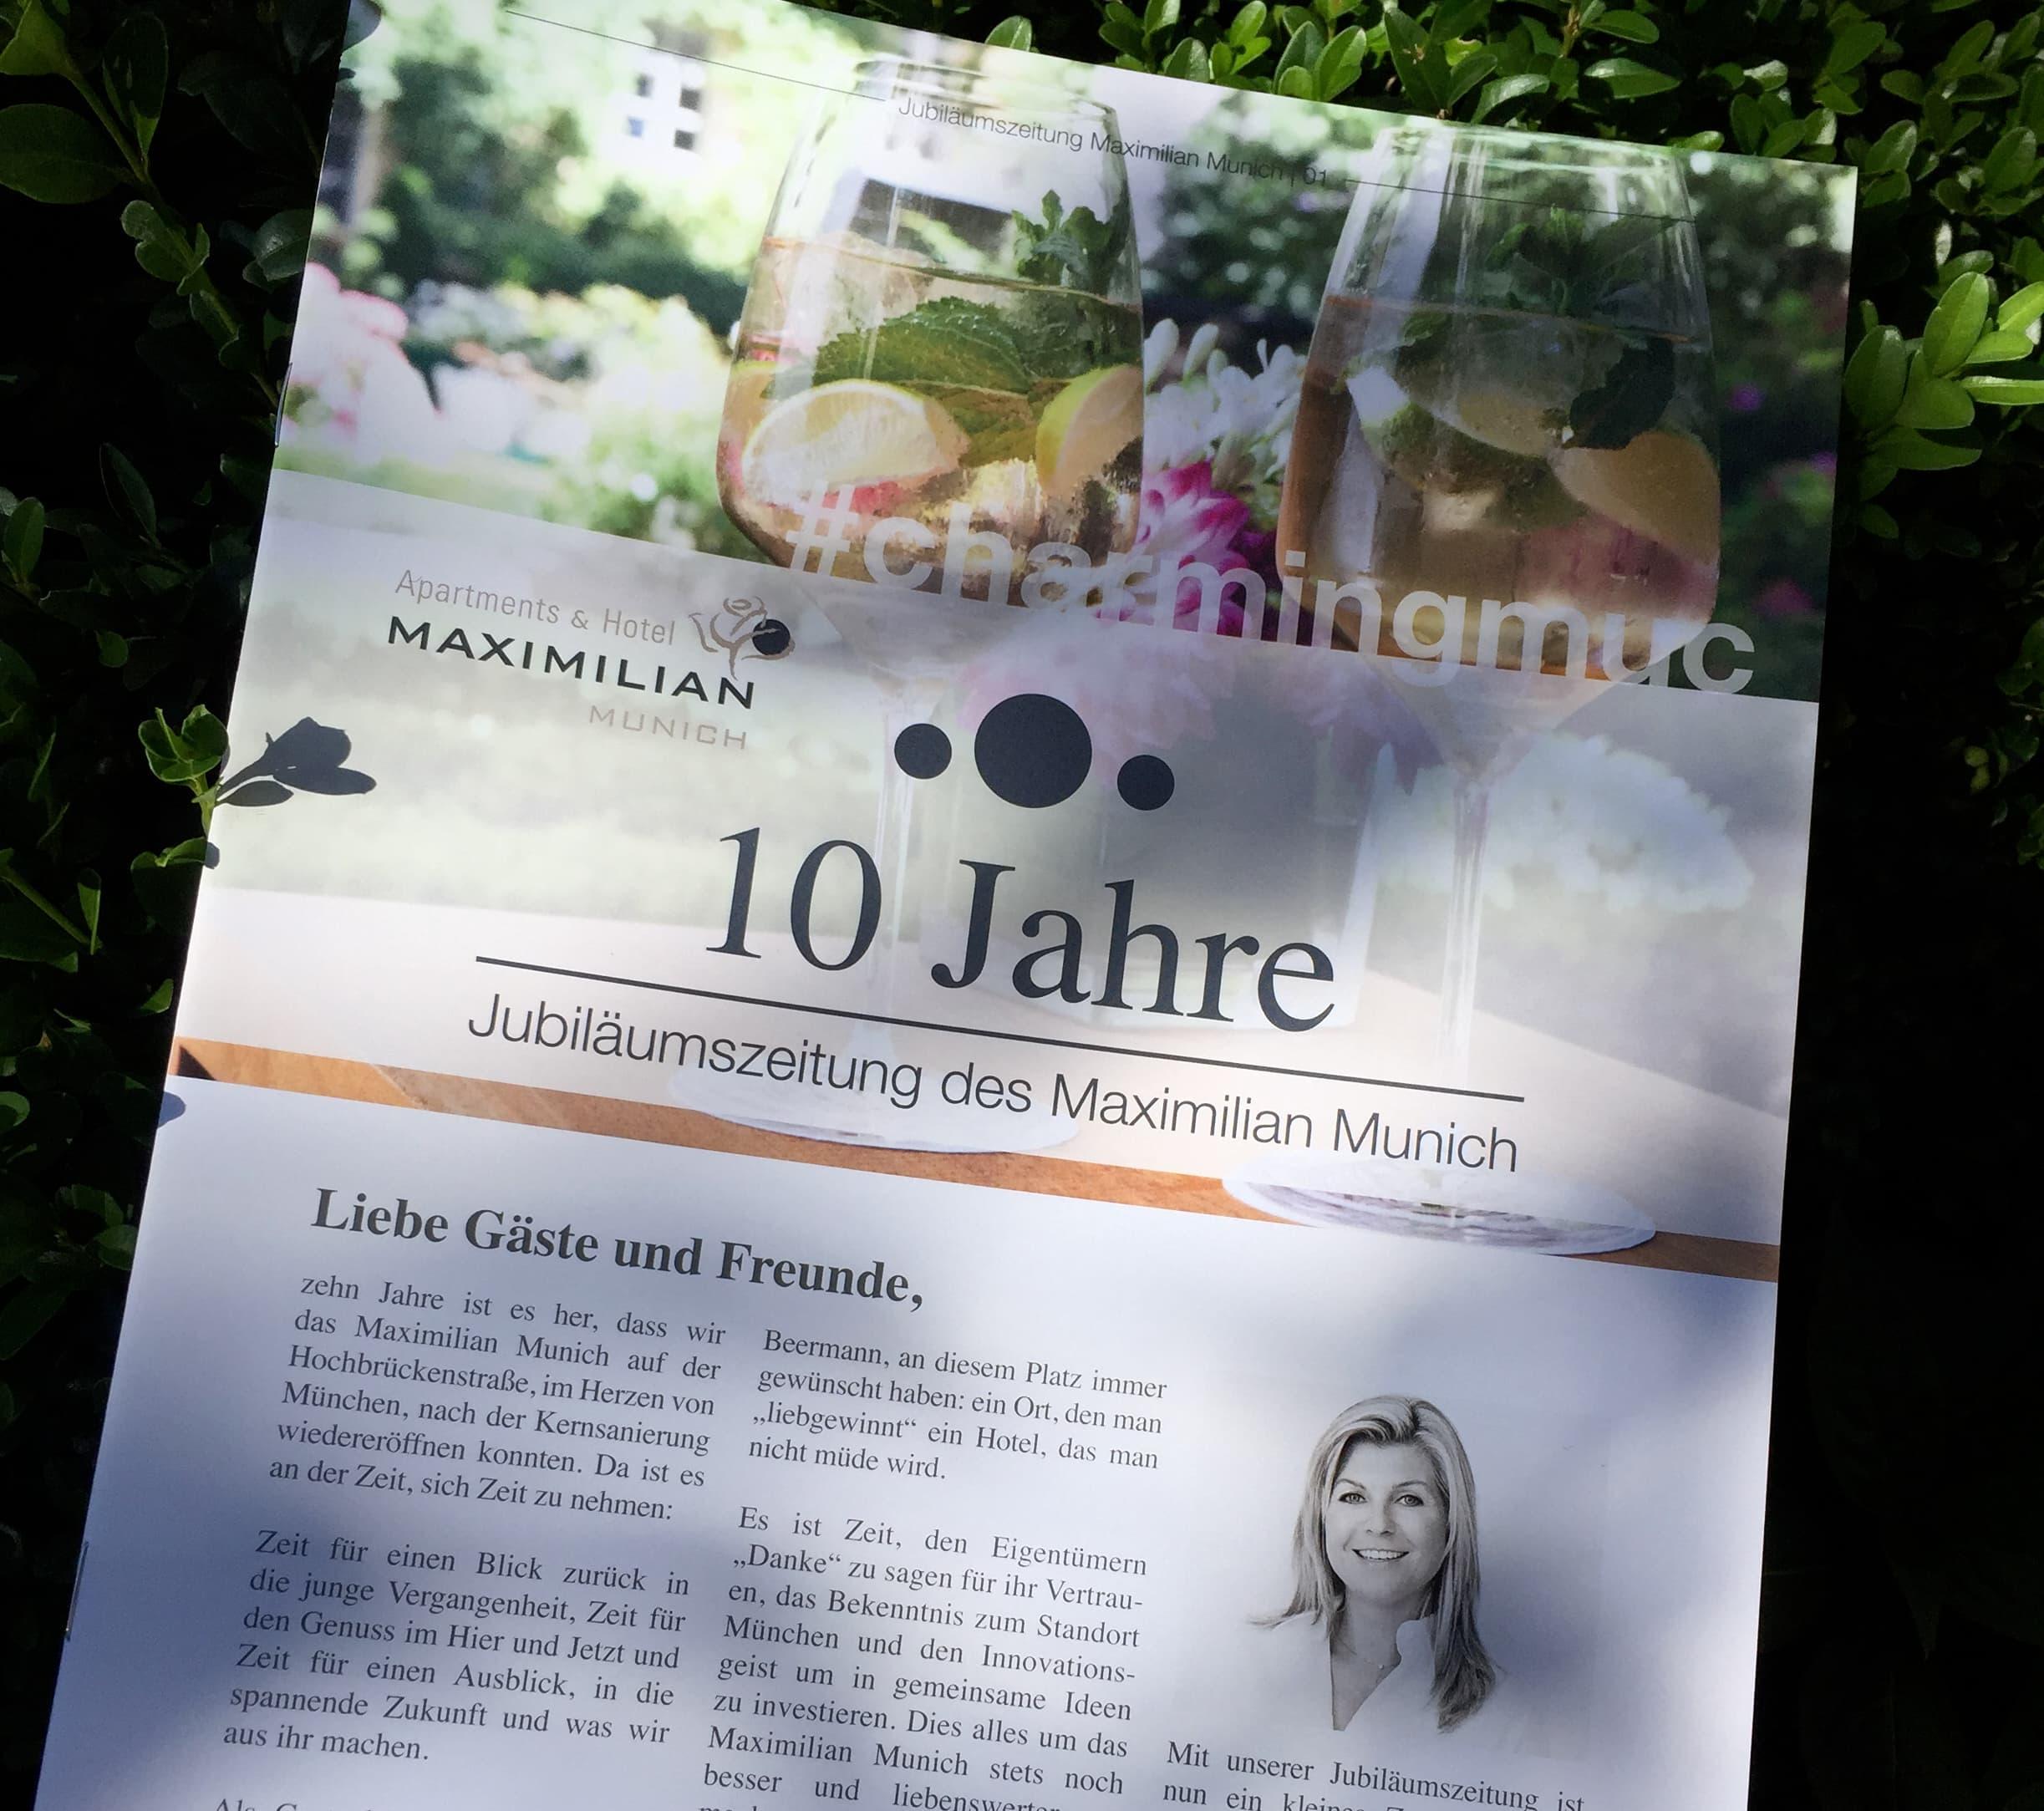 Boutique Hotel Maximilian Munich Newsletter